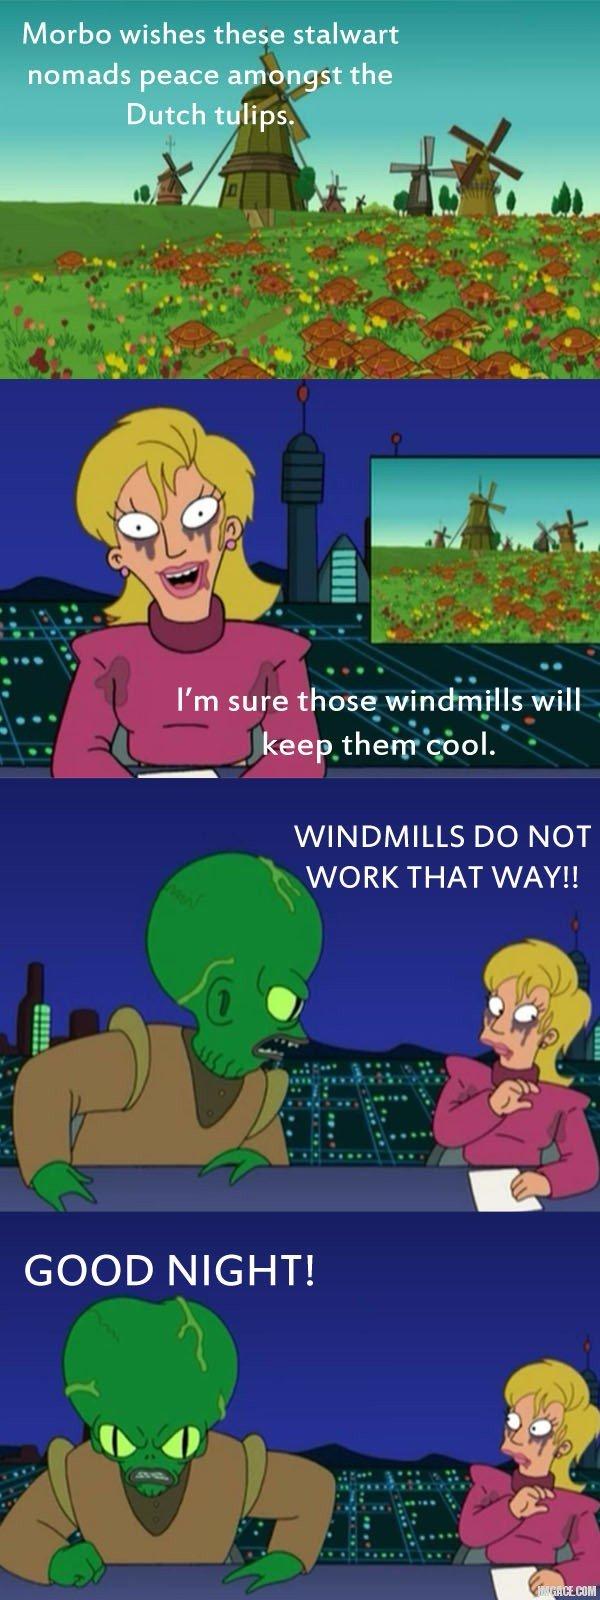 WINDMILLS DO NOT WORK THAT WAY